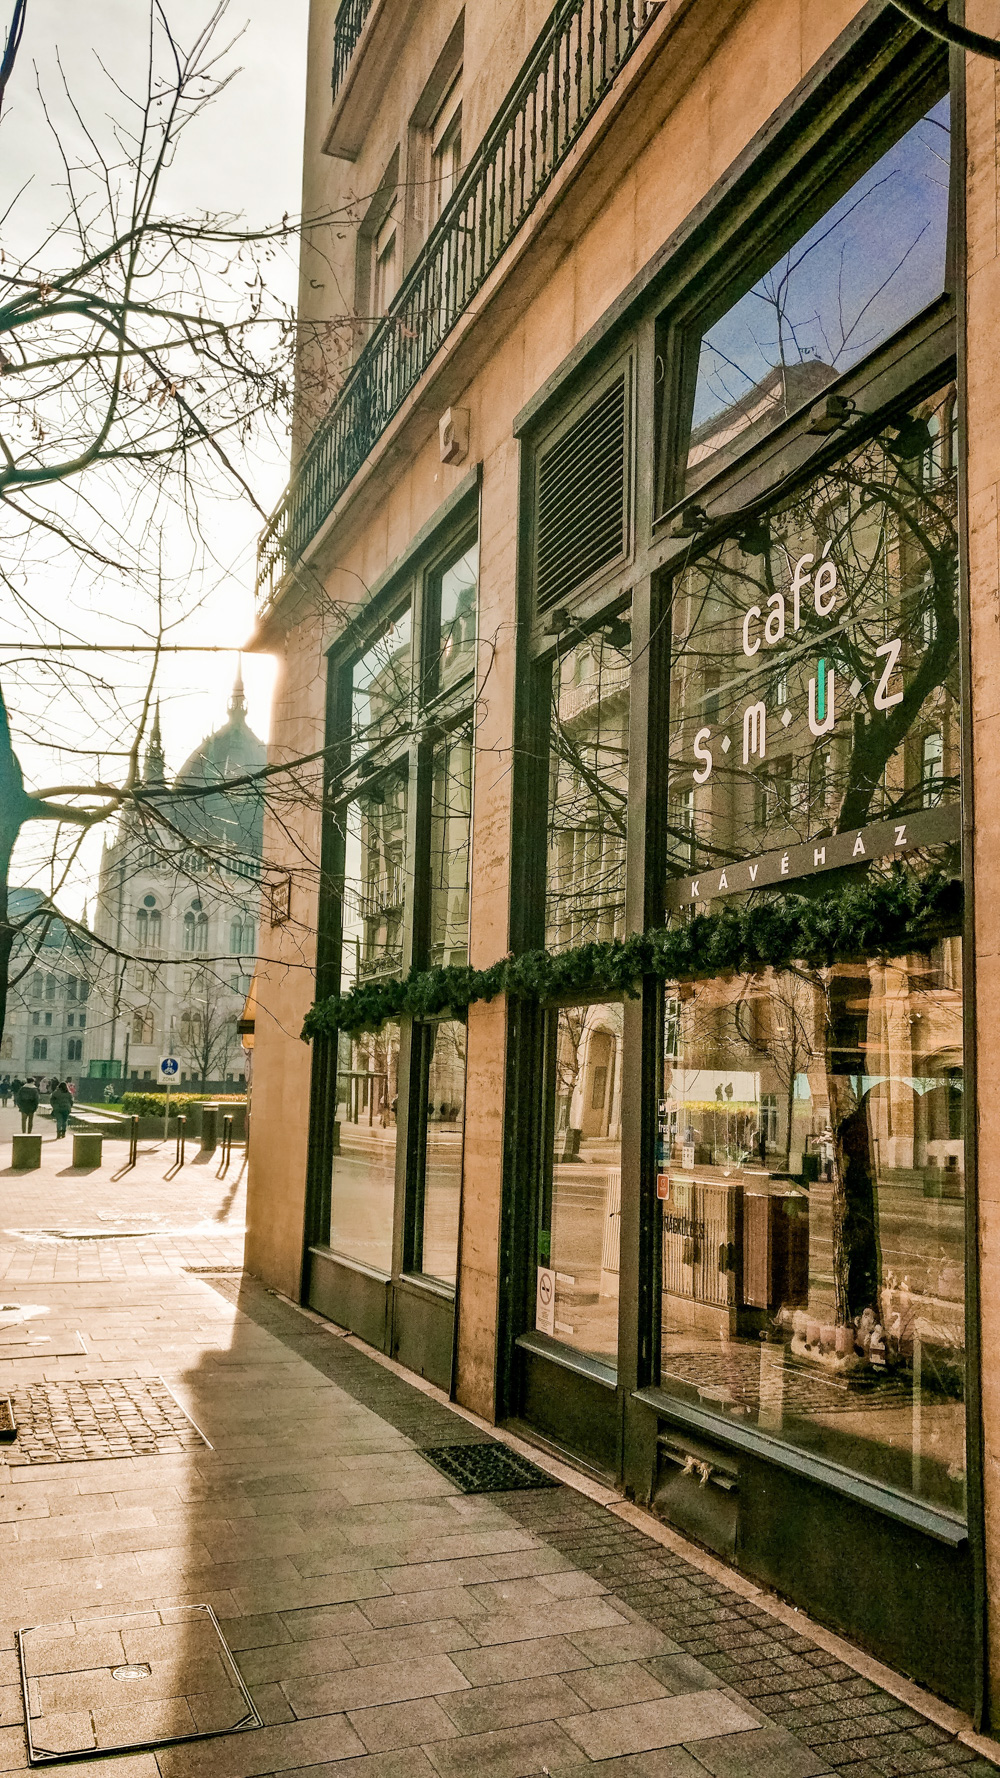 Café Smúz - virág neked - Budapest's best breakfast & brunch places close to the Parliament | Aliz's Wonderland